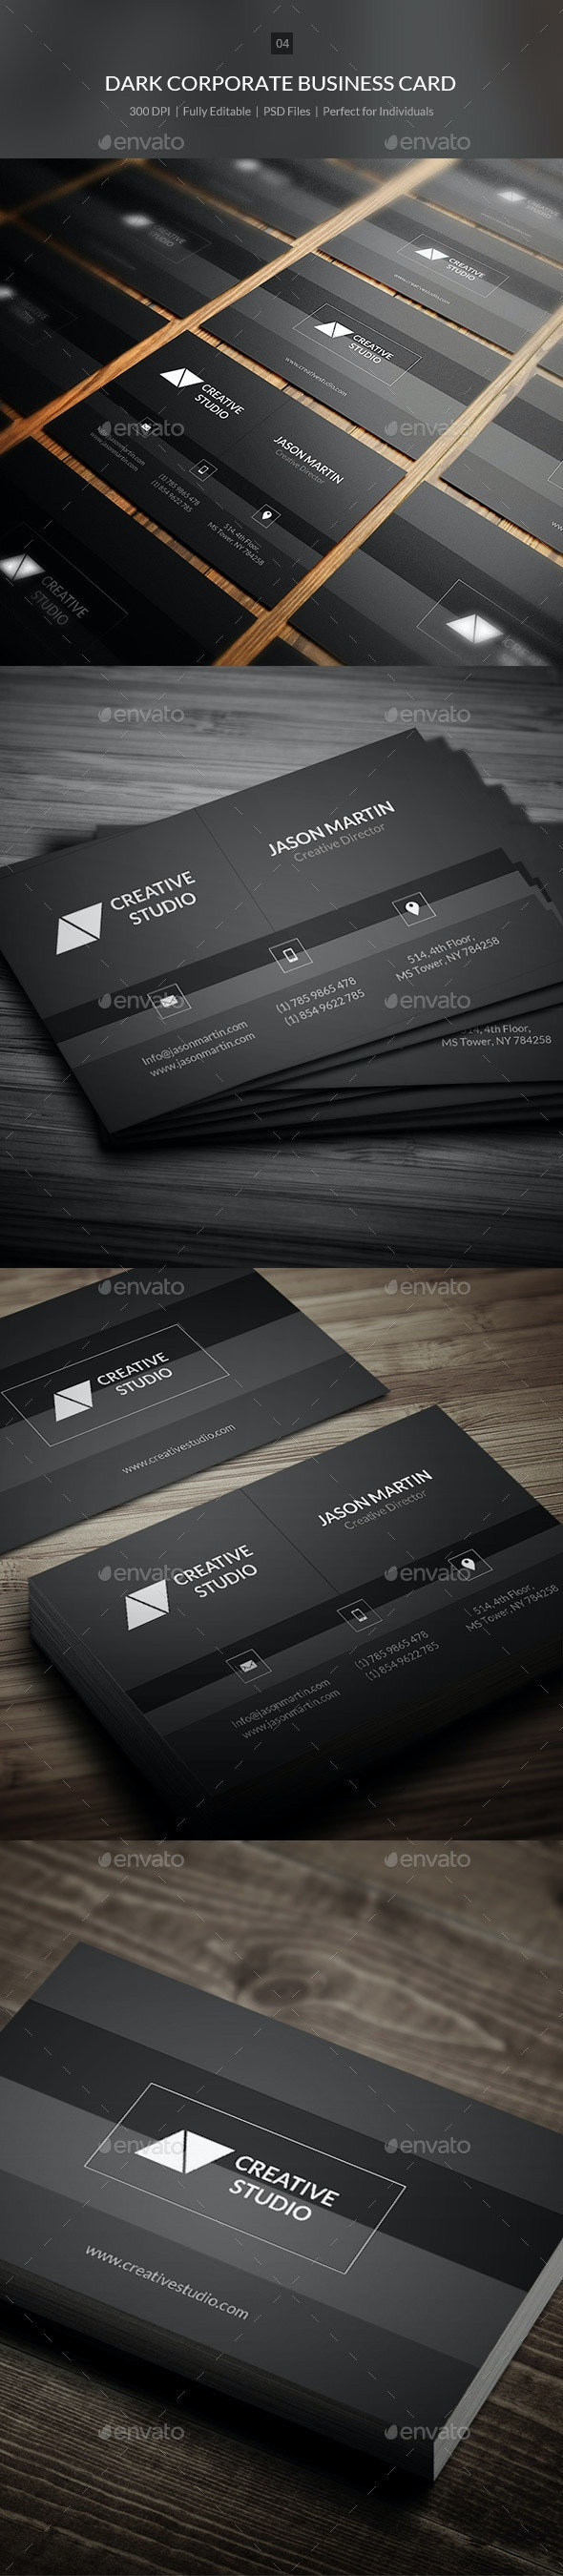 Dark Corporate Business Card - 04 - Corporate Business Cards